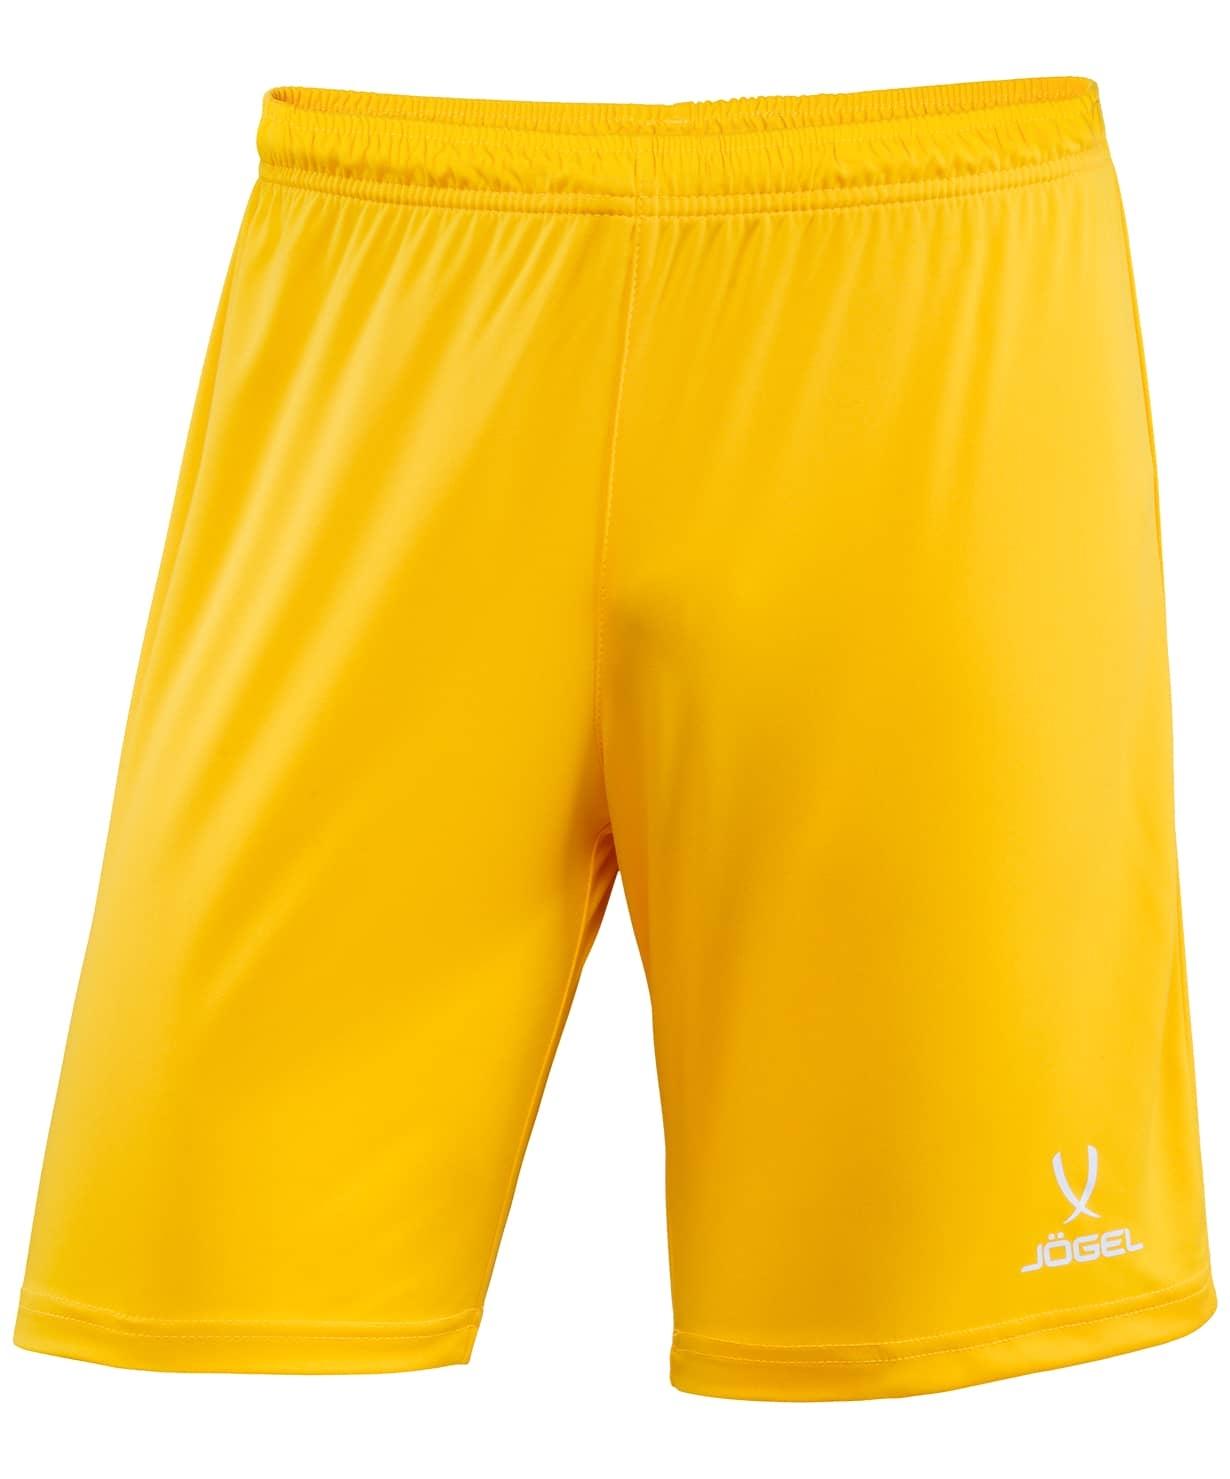 Шорты футбольные CAMP JFT-1120-041, желтый/белый